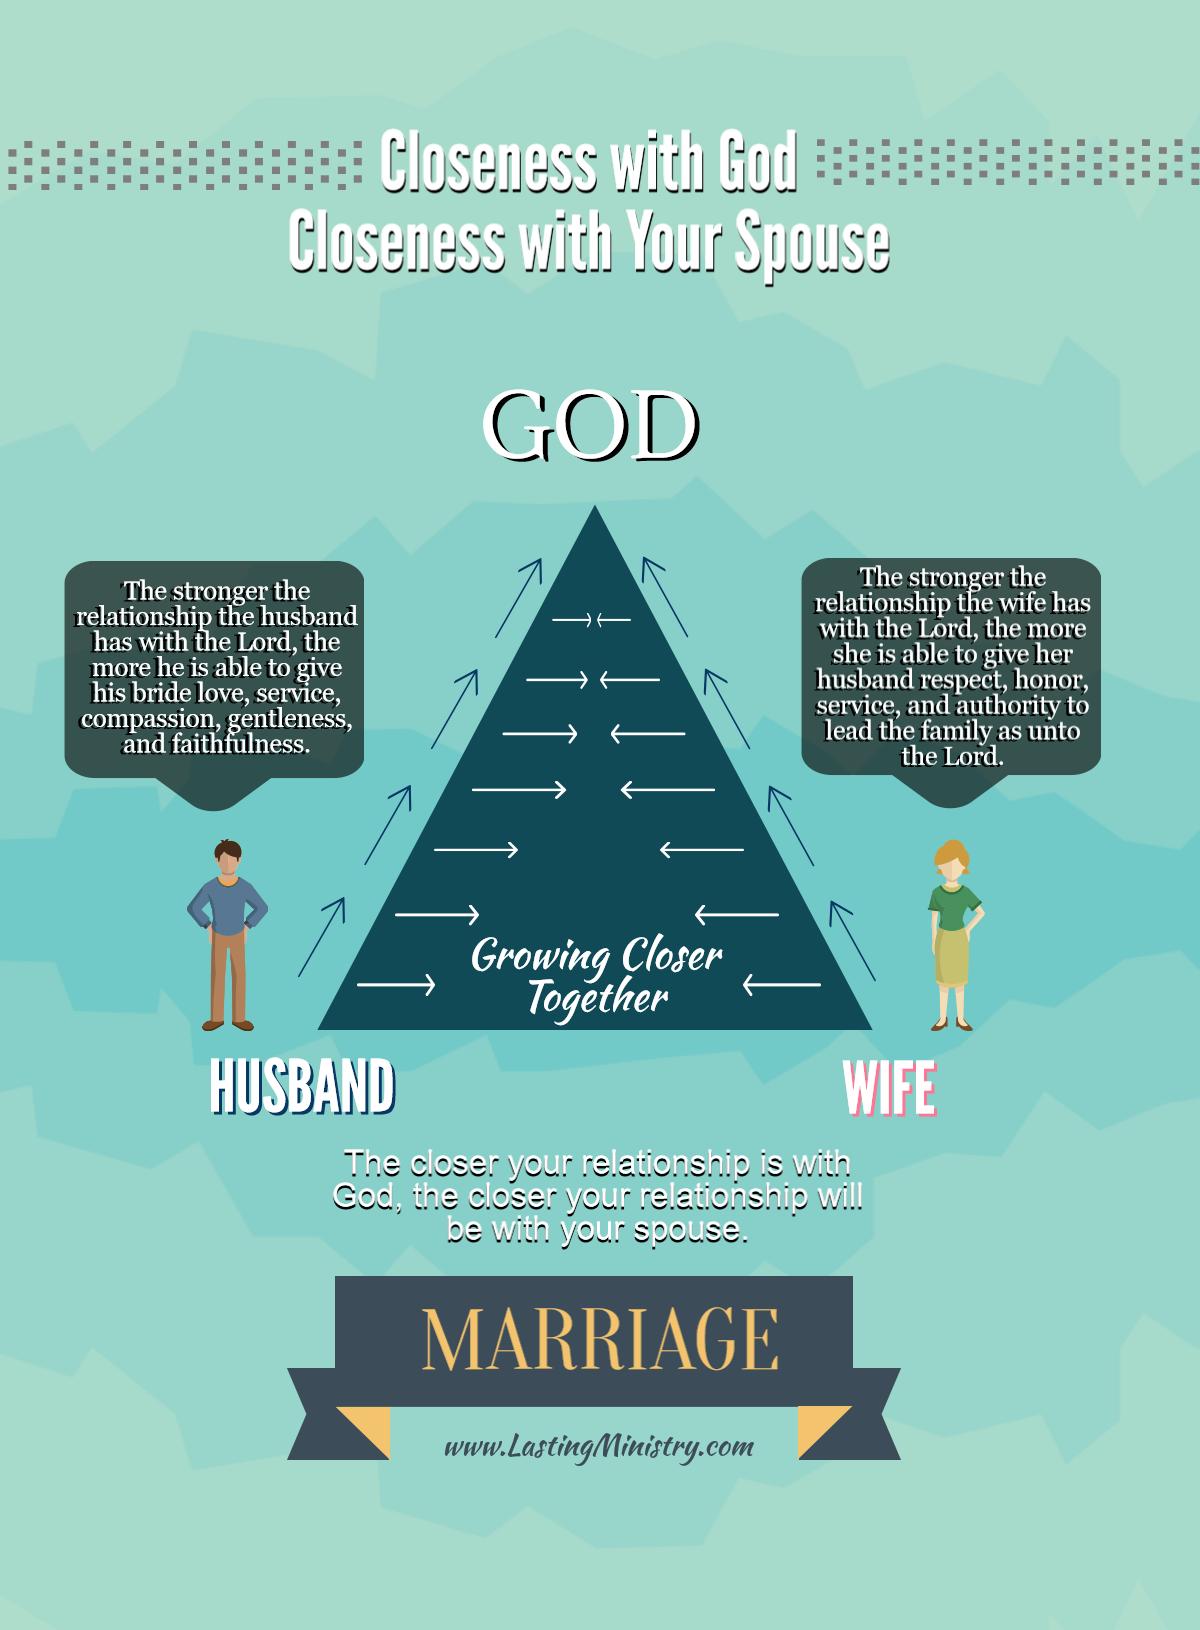 Closeness With God